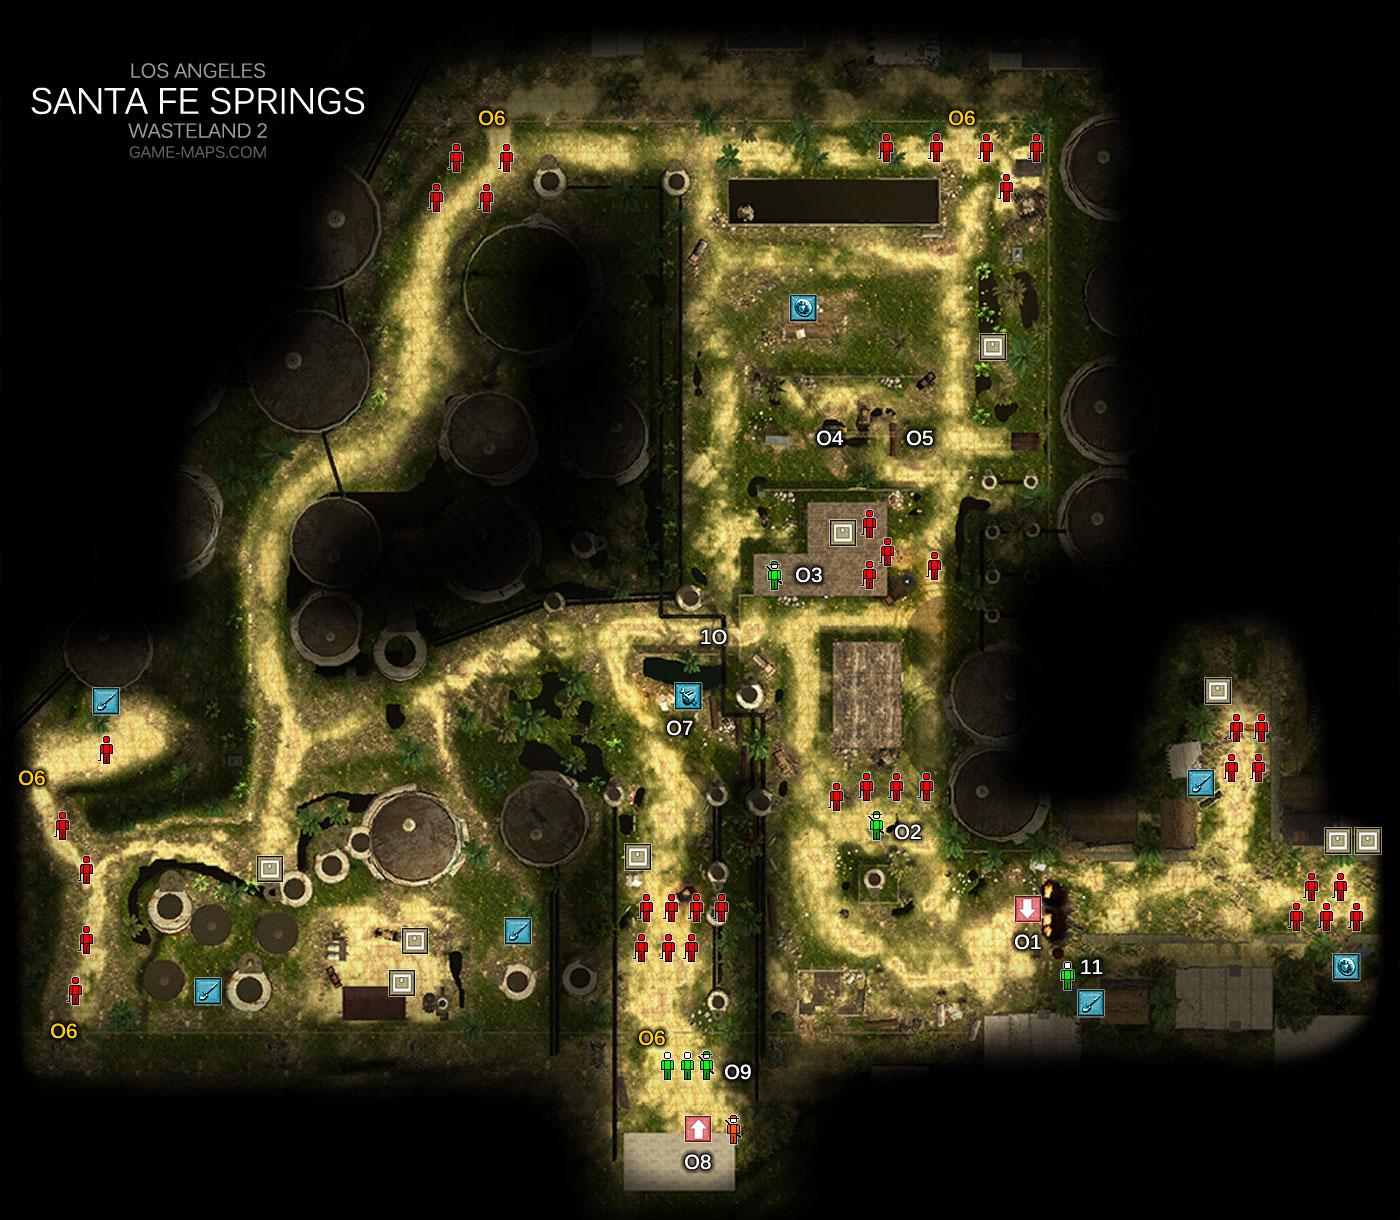 Santa Fe Springs Los Angeles Wasteland 2 Game Maps Com